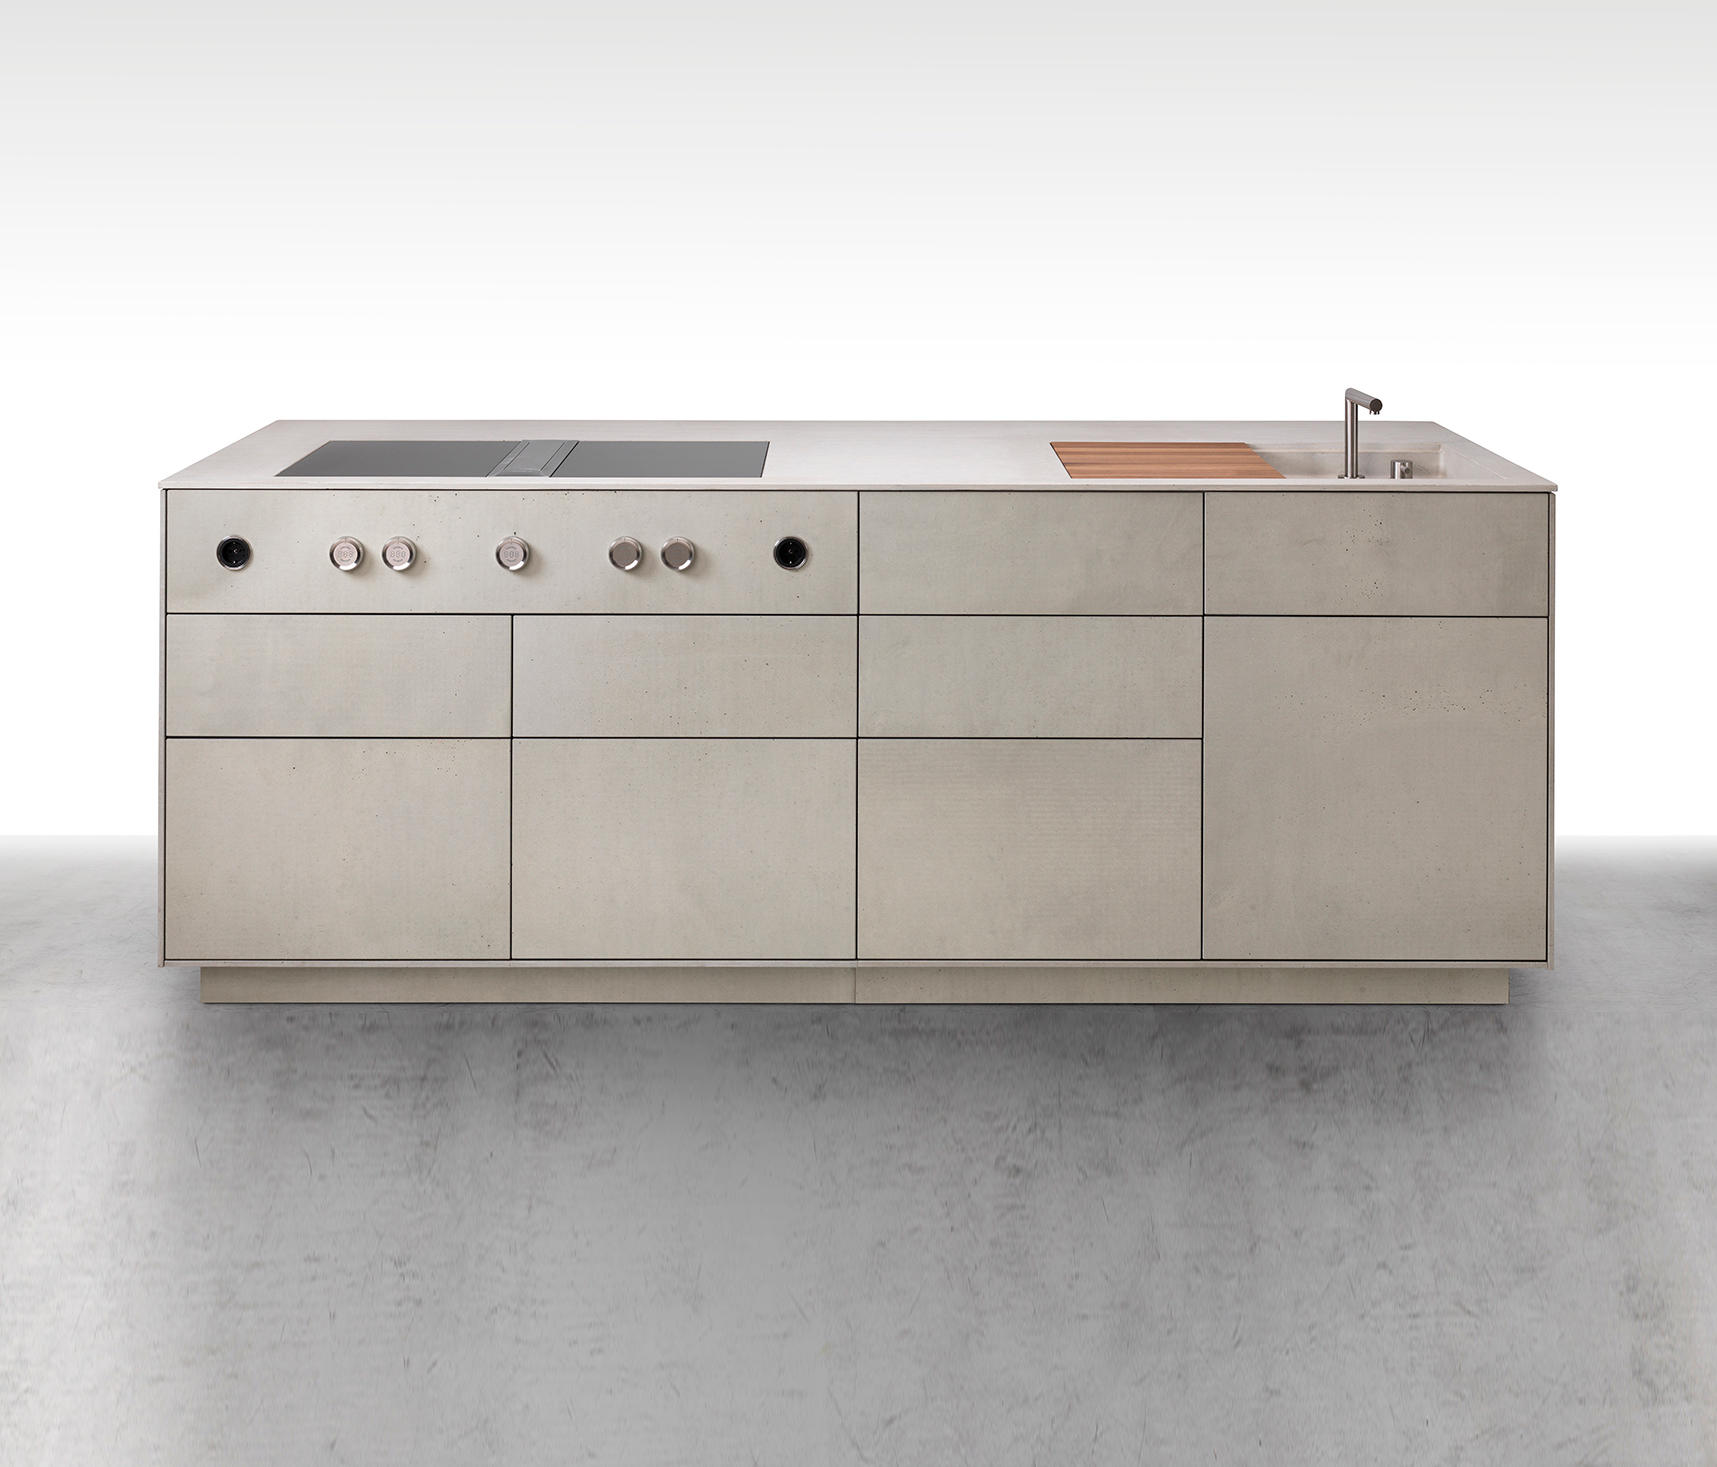 MILANO - Beton Platten von Dade Design AG concrete works Beton ...